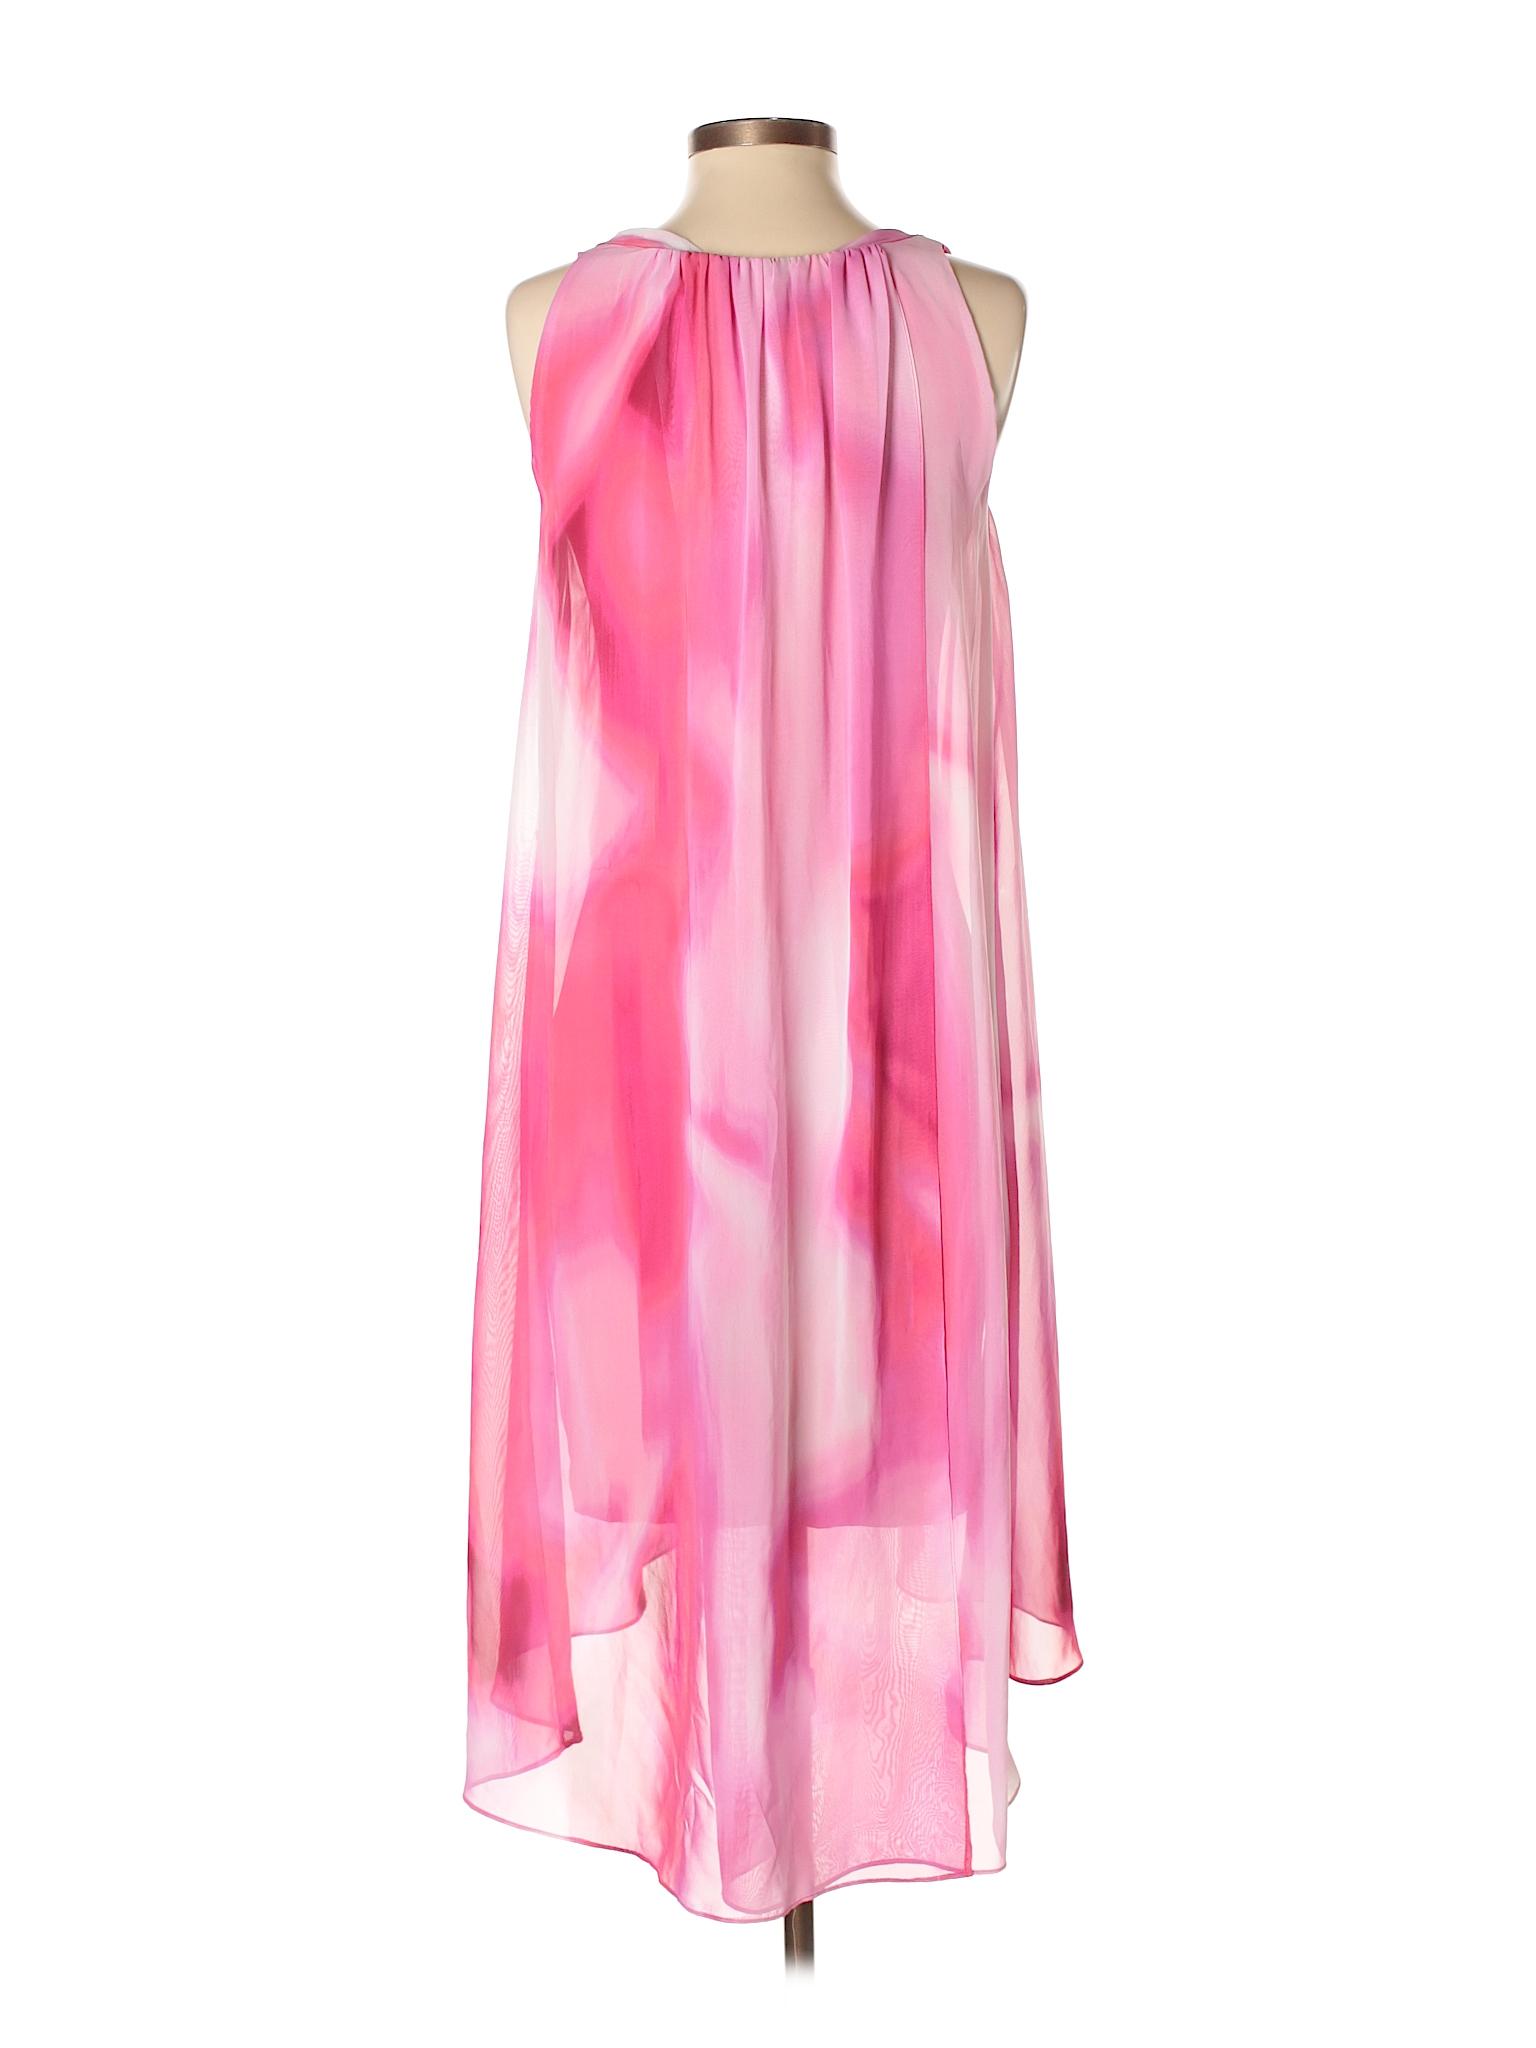 Selling Tahari Casual Tahari Casual Dress Selling Tahari Casual Dress Selling wAqIPPx8